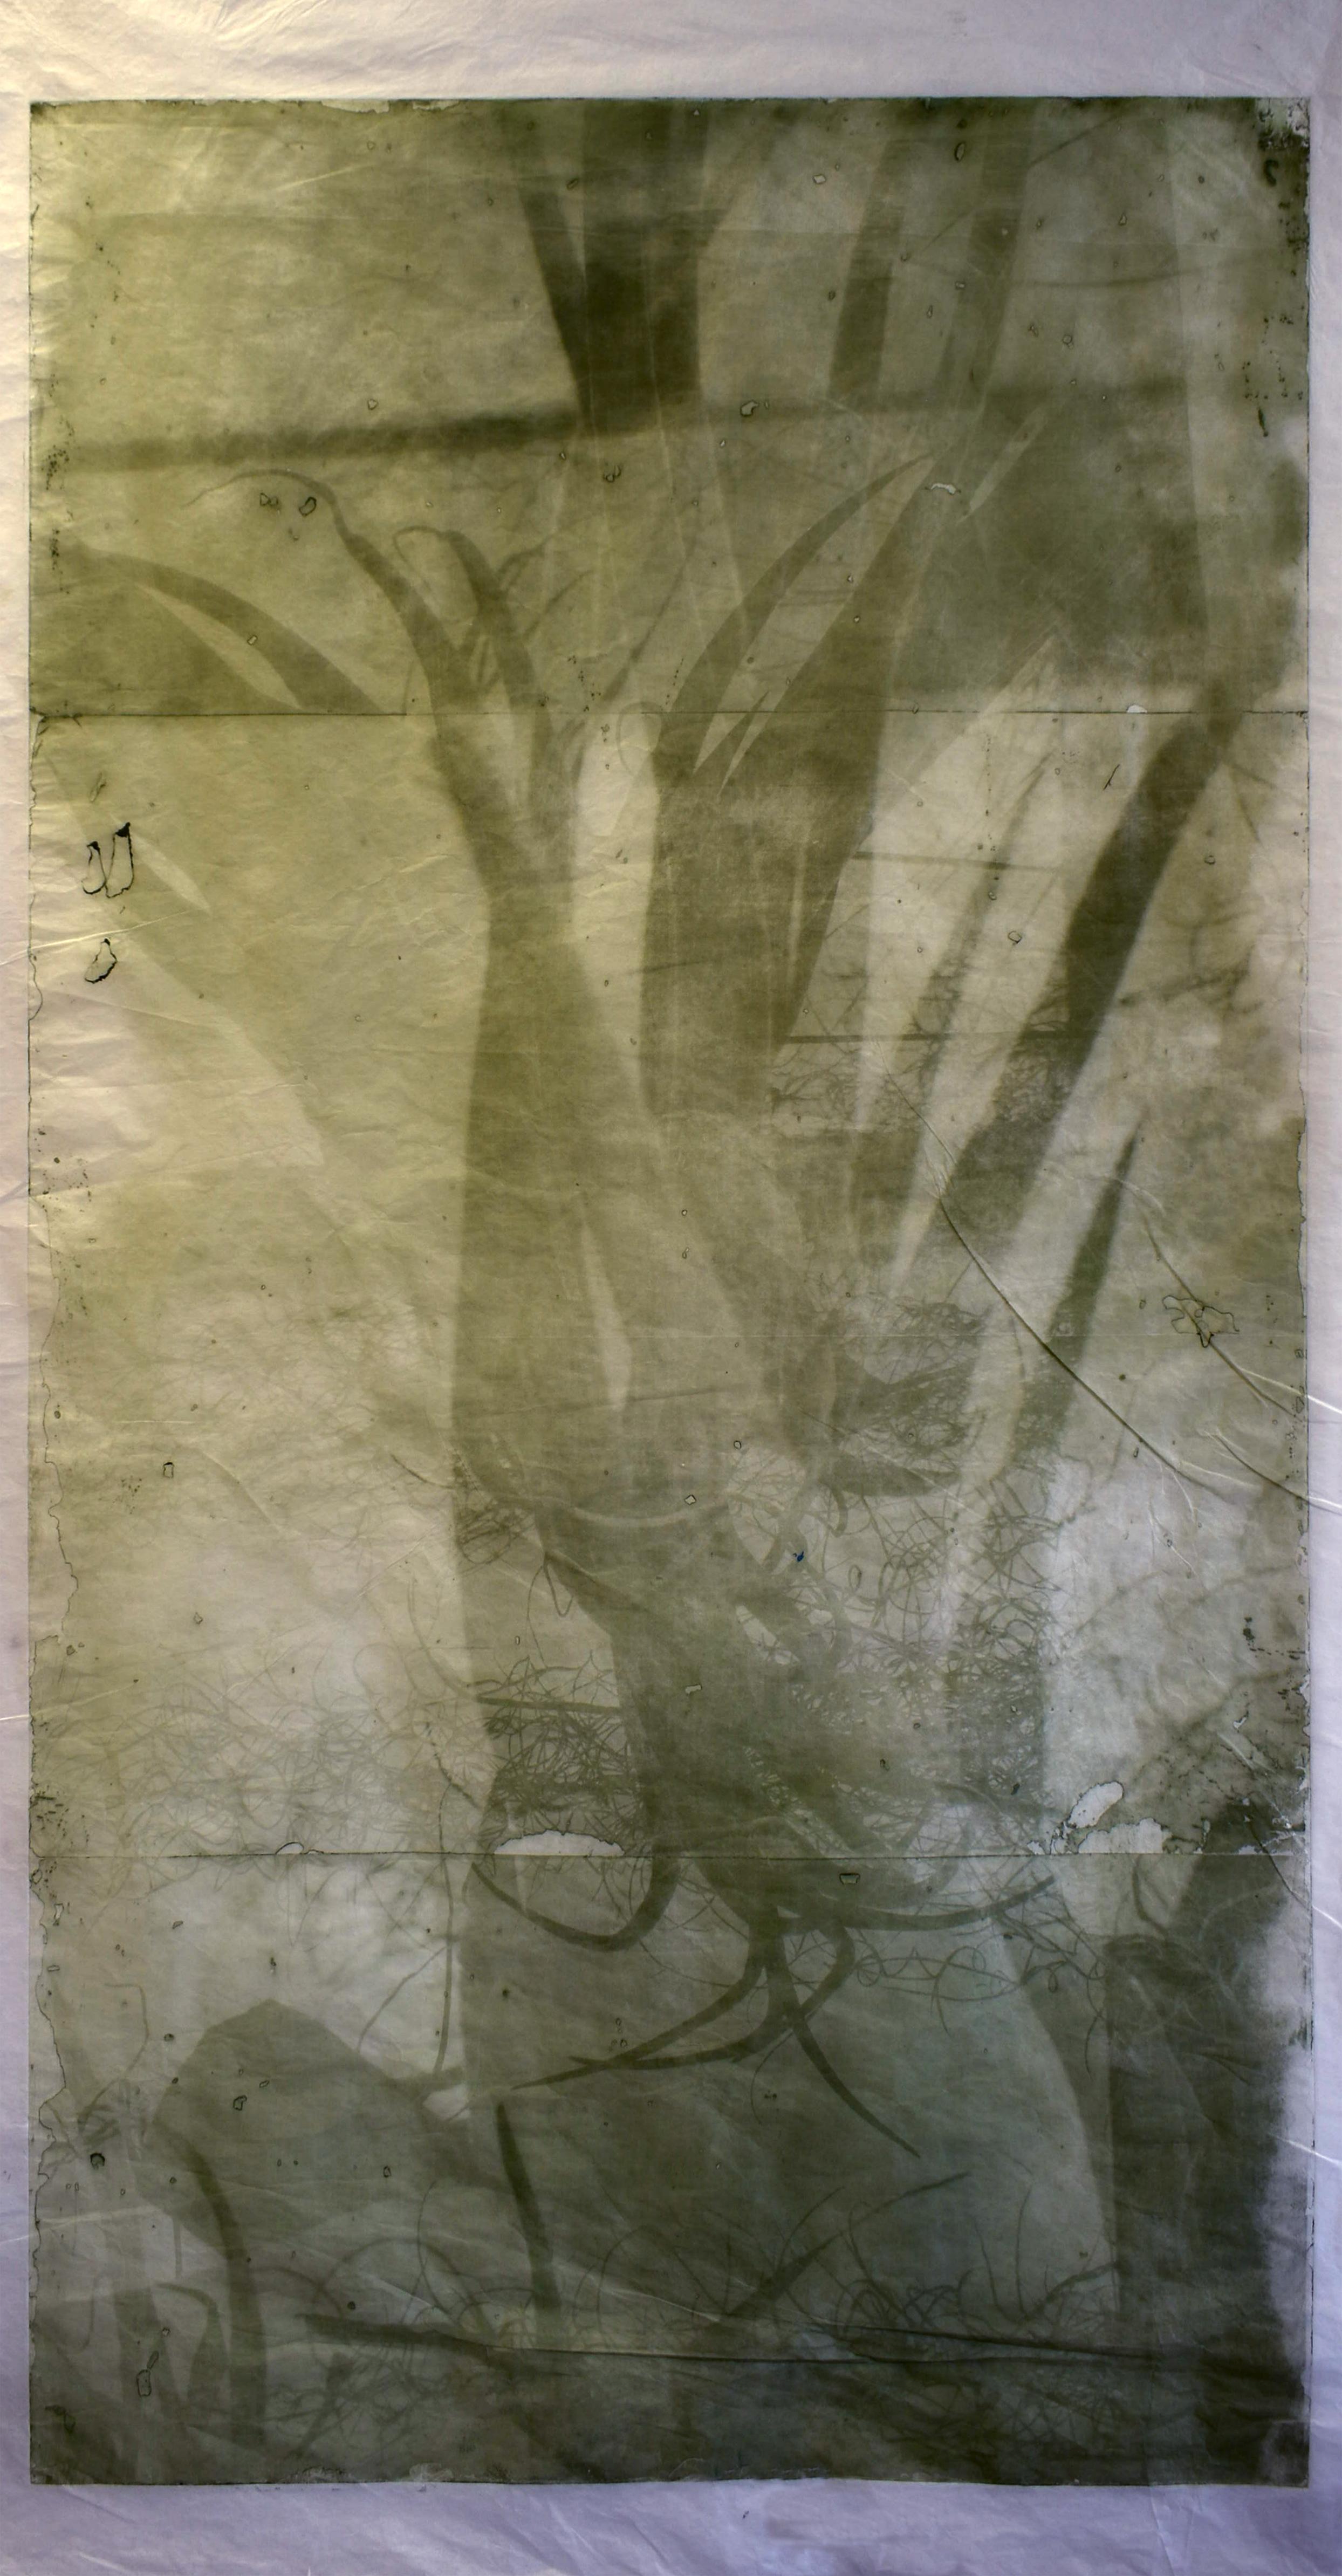 Interlaced, No. 1  2019,   series of 6 photopolymer prints on Korean semi-transparent long fiber paper, 74cm x 141cm each.